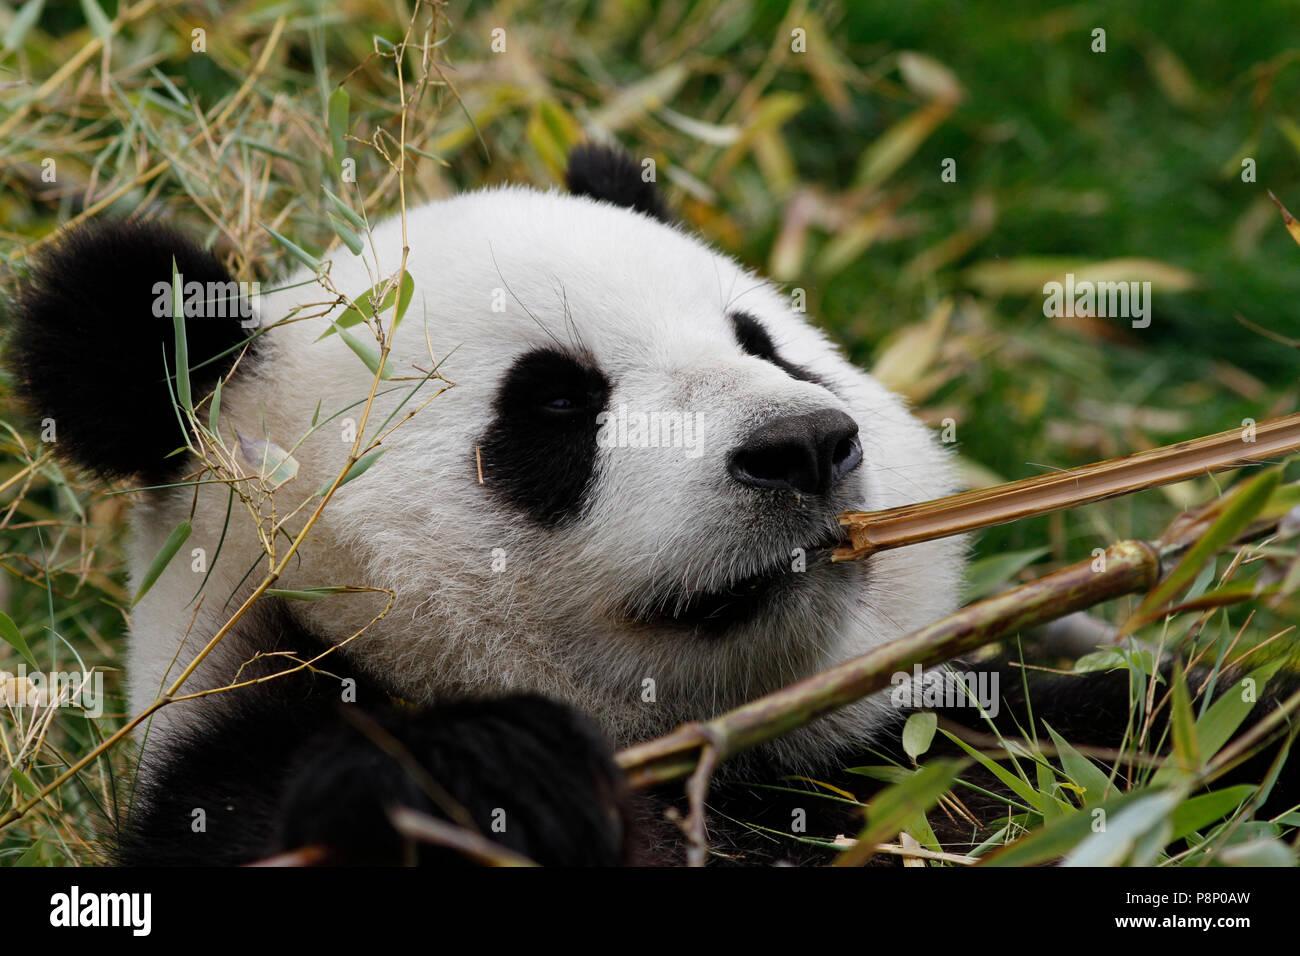 Bambus Essen Panda Stockfoto Bild 211924913 Alamy